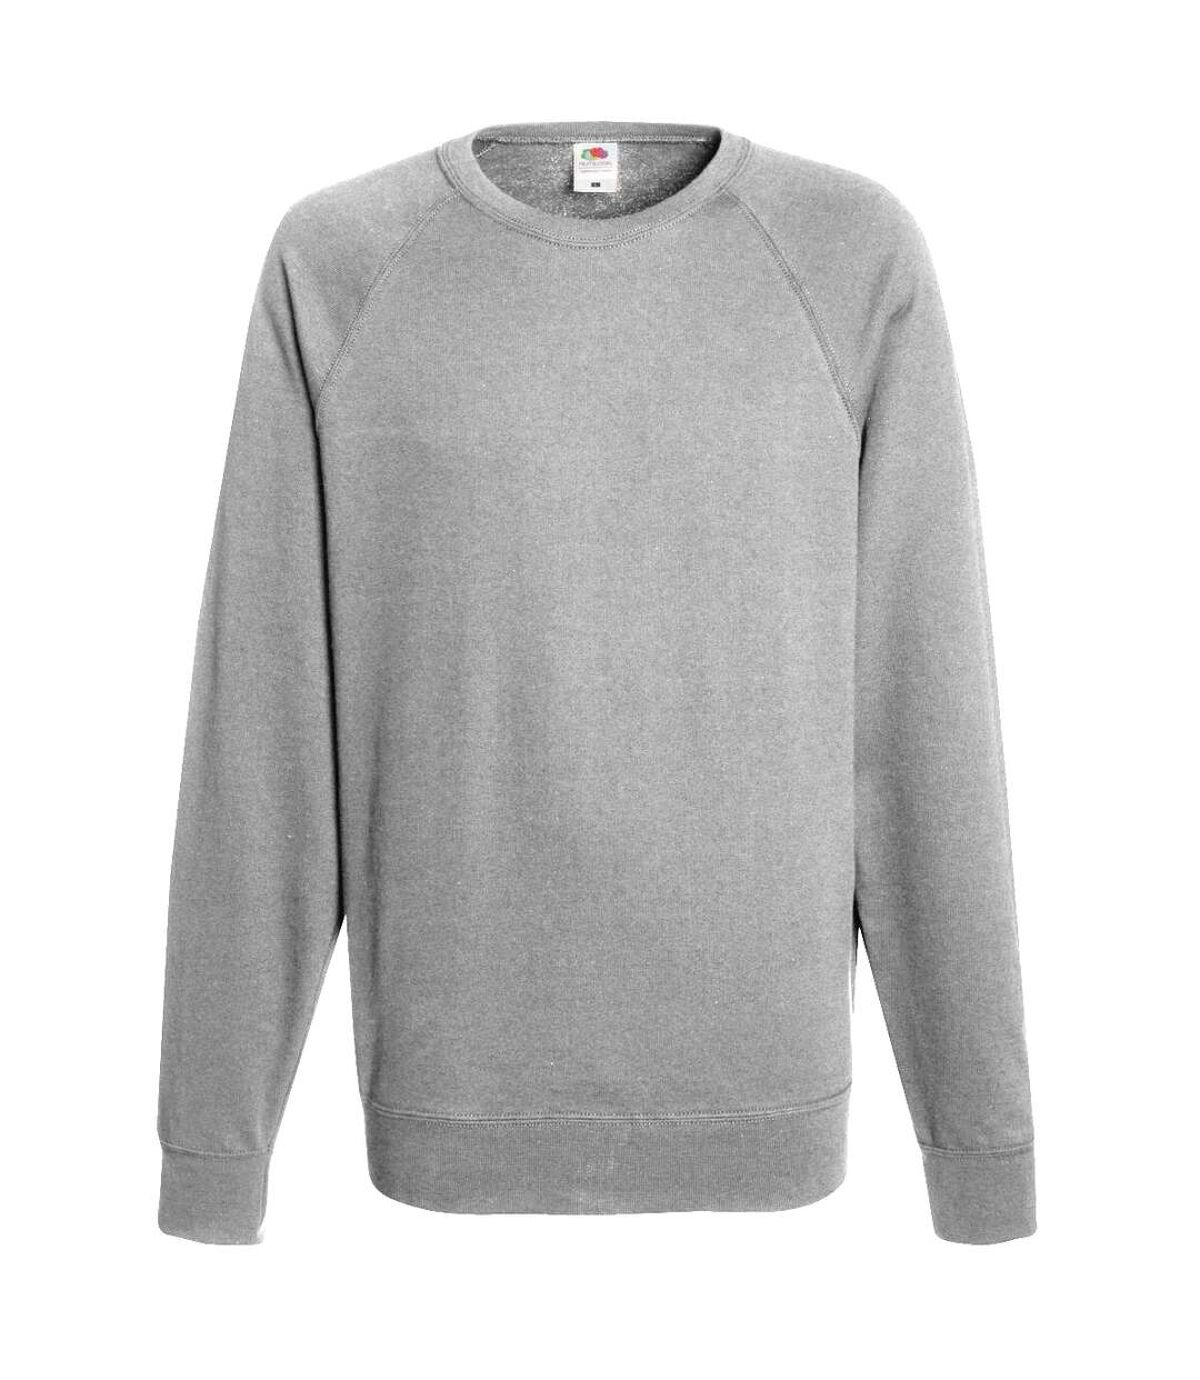 Fruit Of The Loom Mens Lightweight Raglan Sweatshirt (240 GSM) (Heather Grey) - UTBC2653